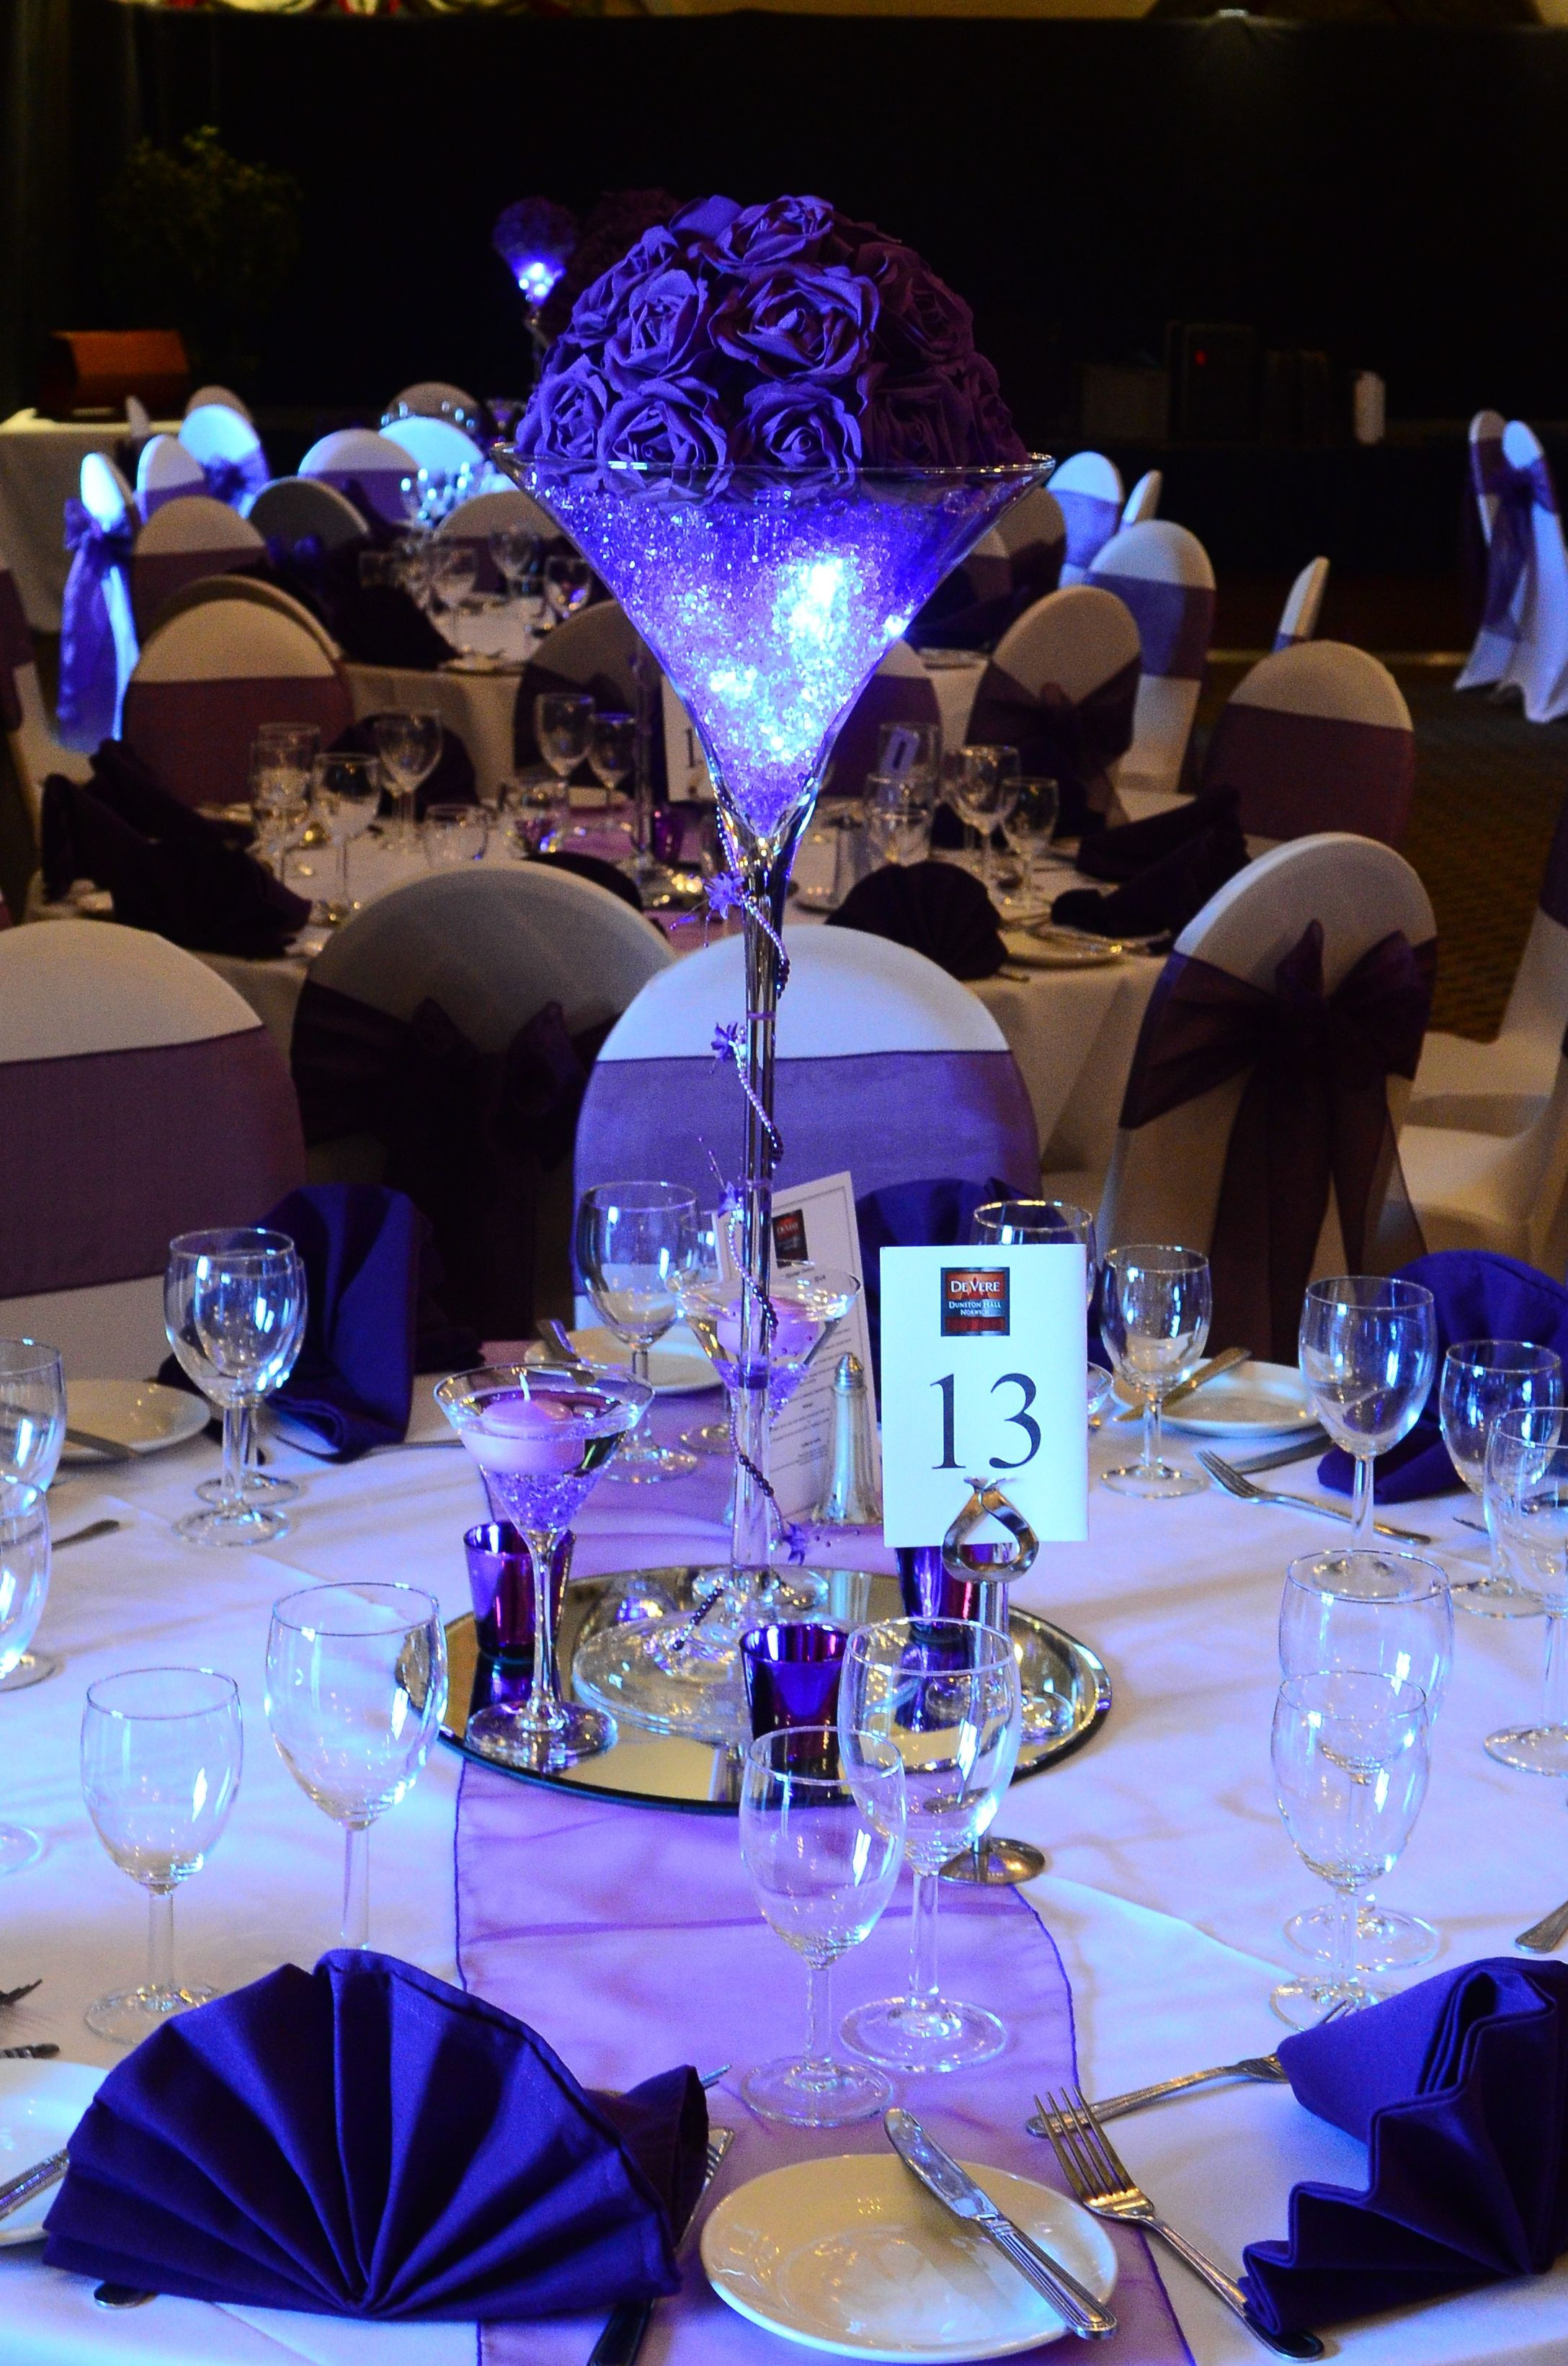 margarita glass vase of purple table centrepiece with purple napkins 2 2176a—3283 in purple table centrepiece with purple napkins 2 2176a—3283